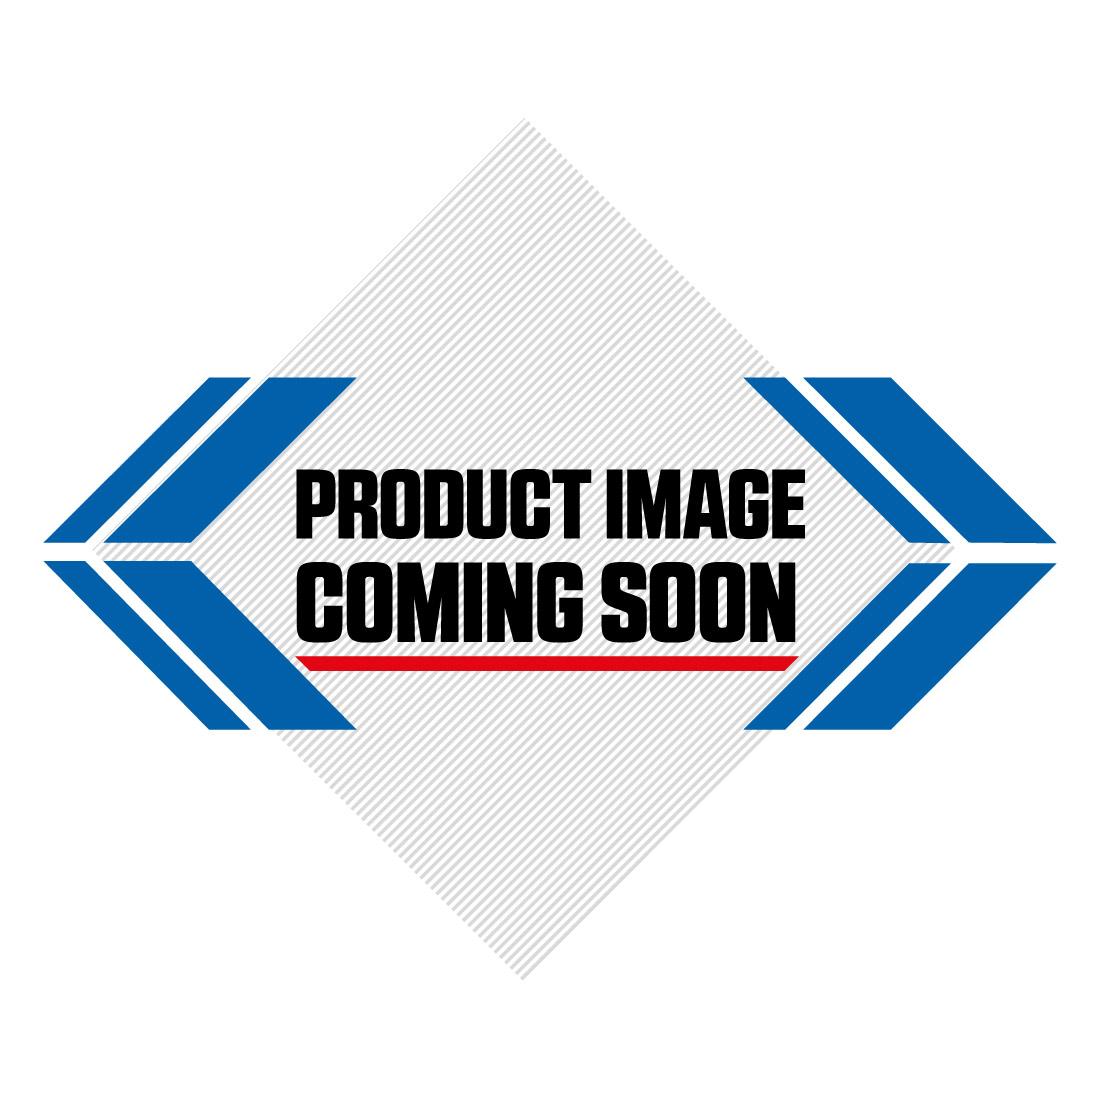 DJI Goggles - Immersive FPV Goggles Image-3>